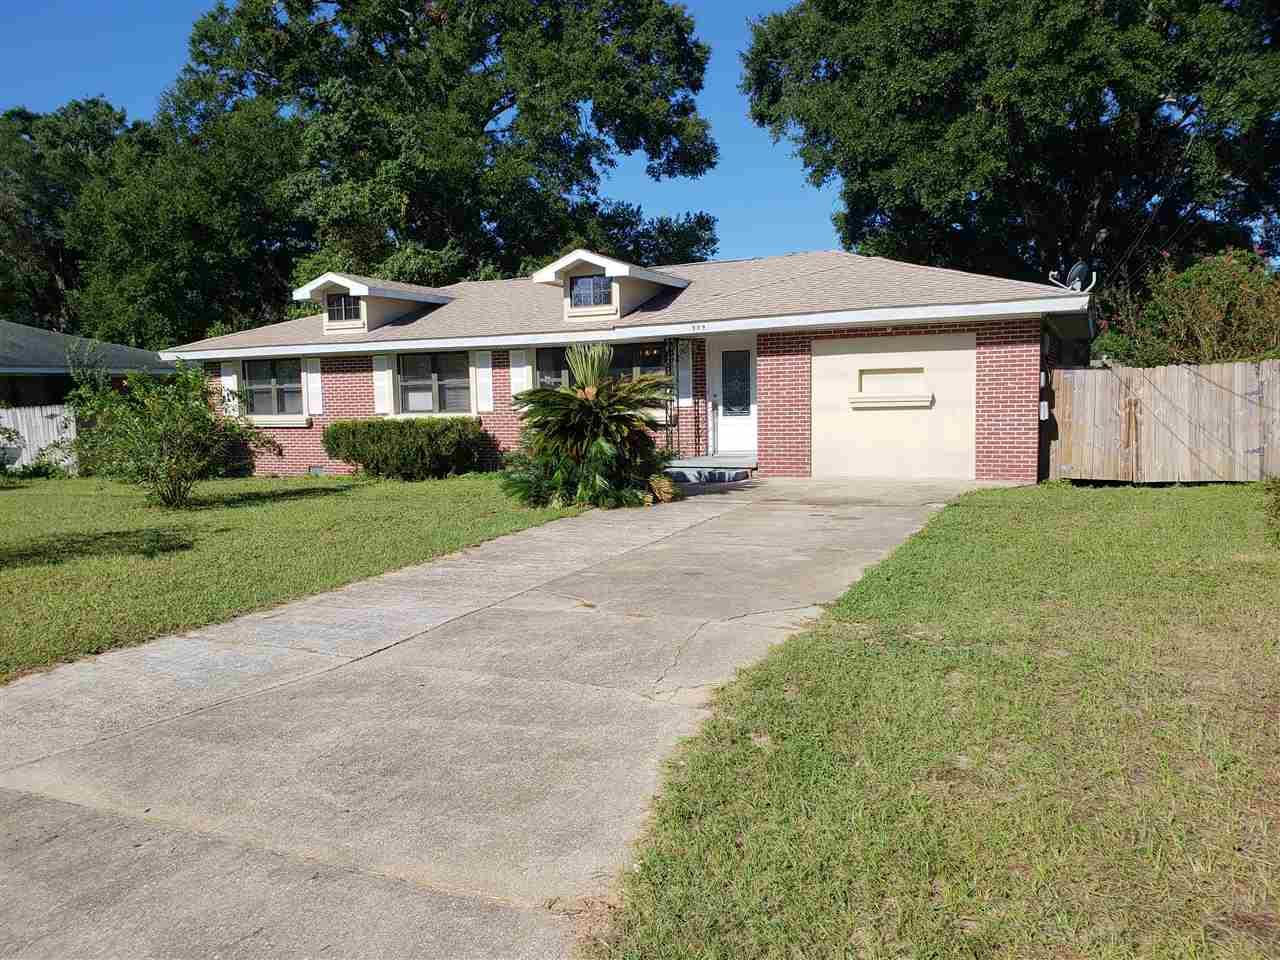 379 N 57th Ave, Pensacola, FL 32506